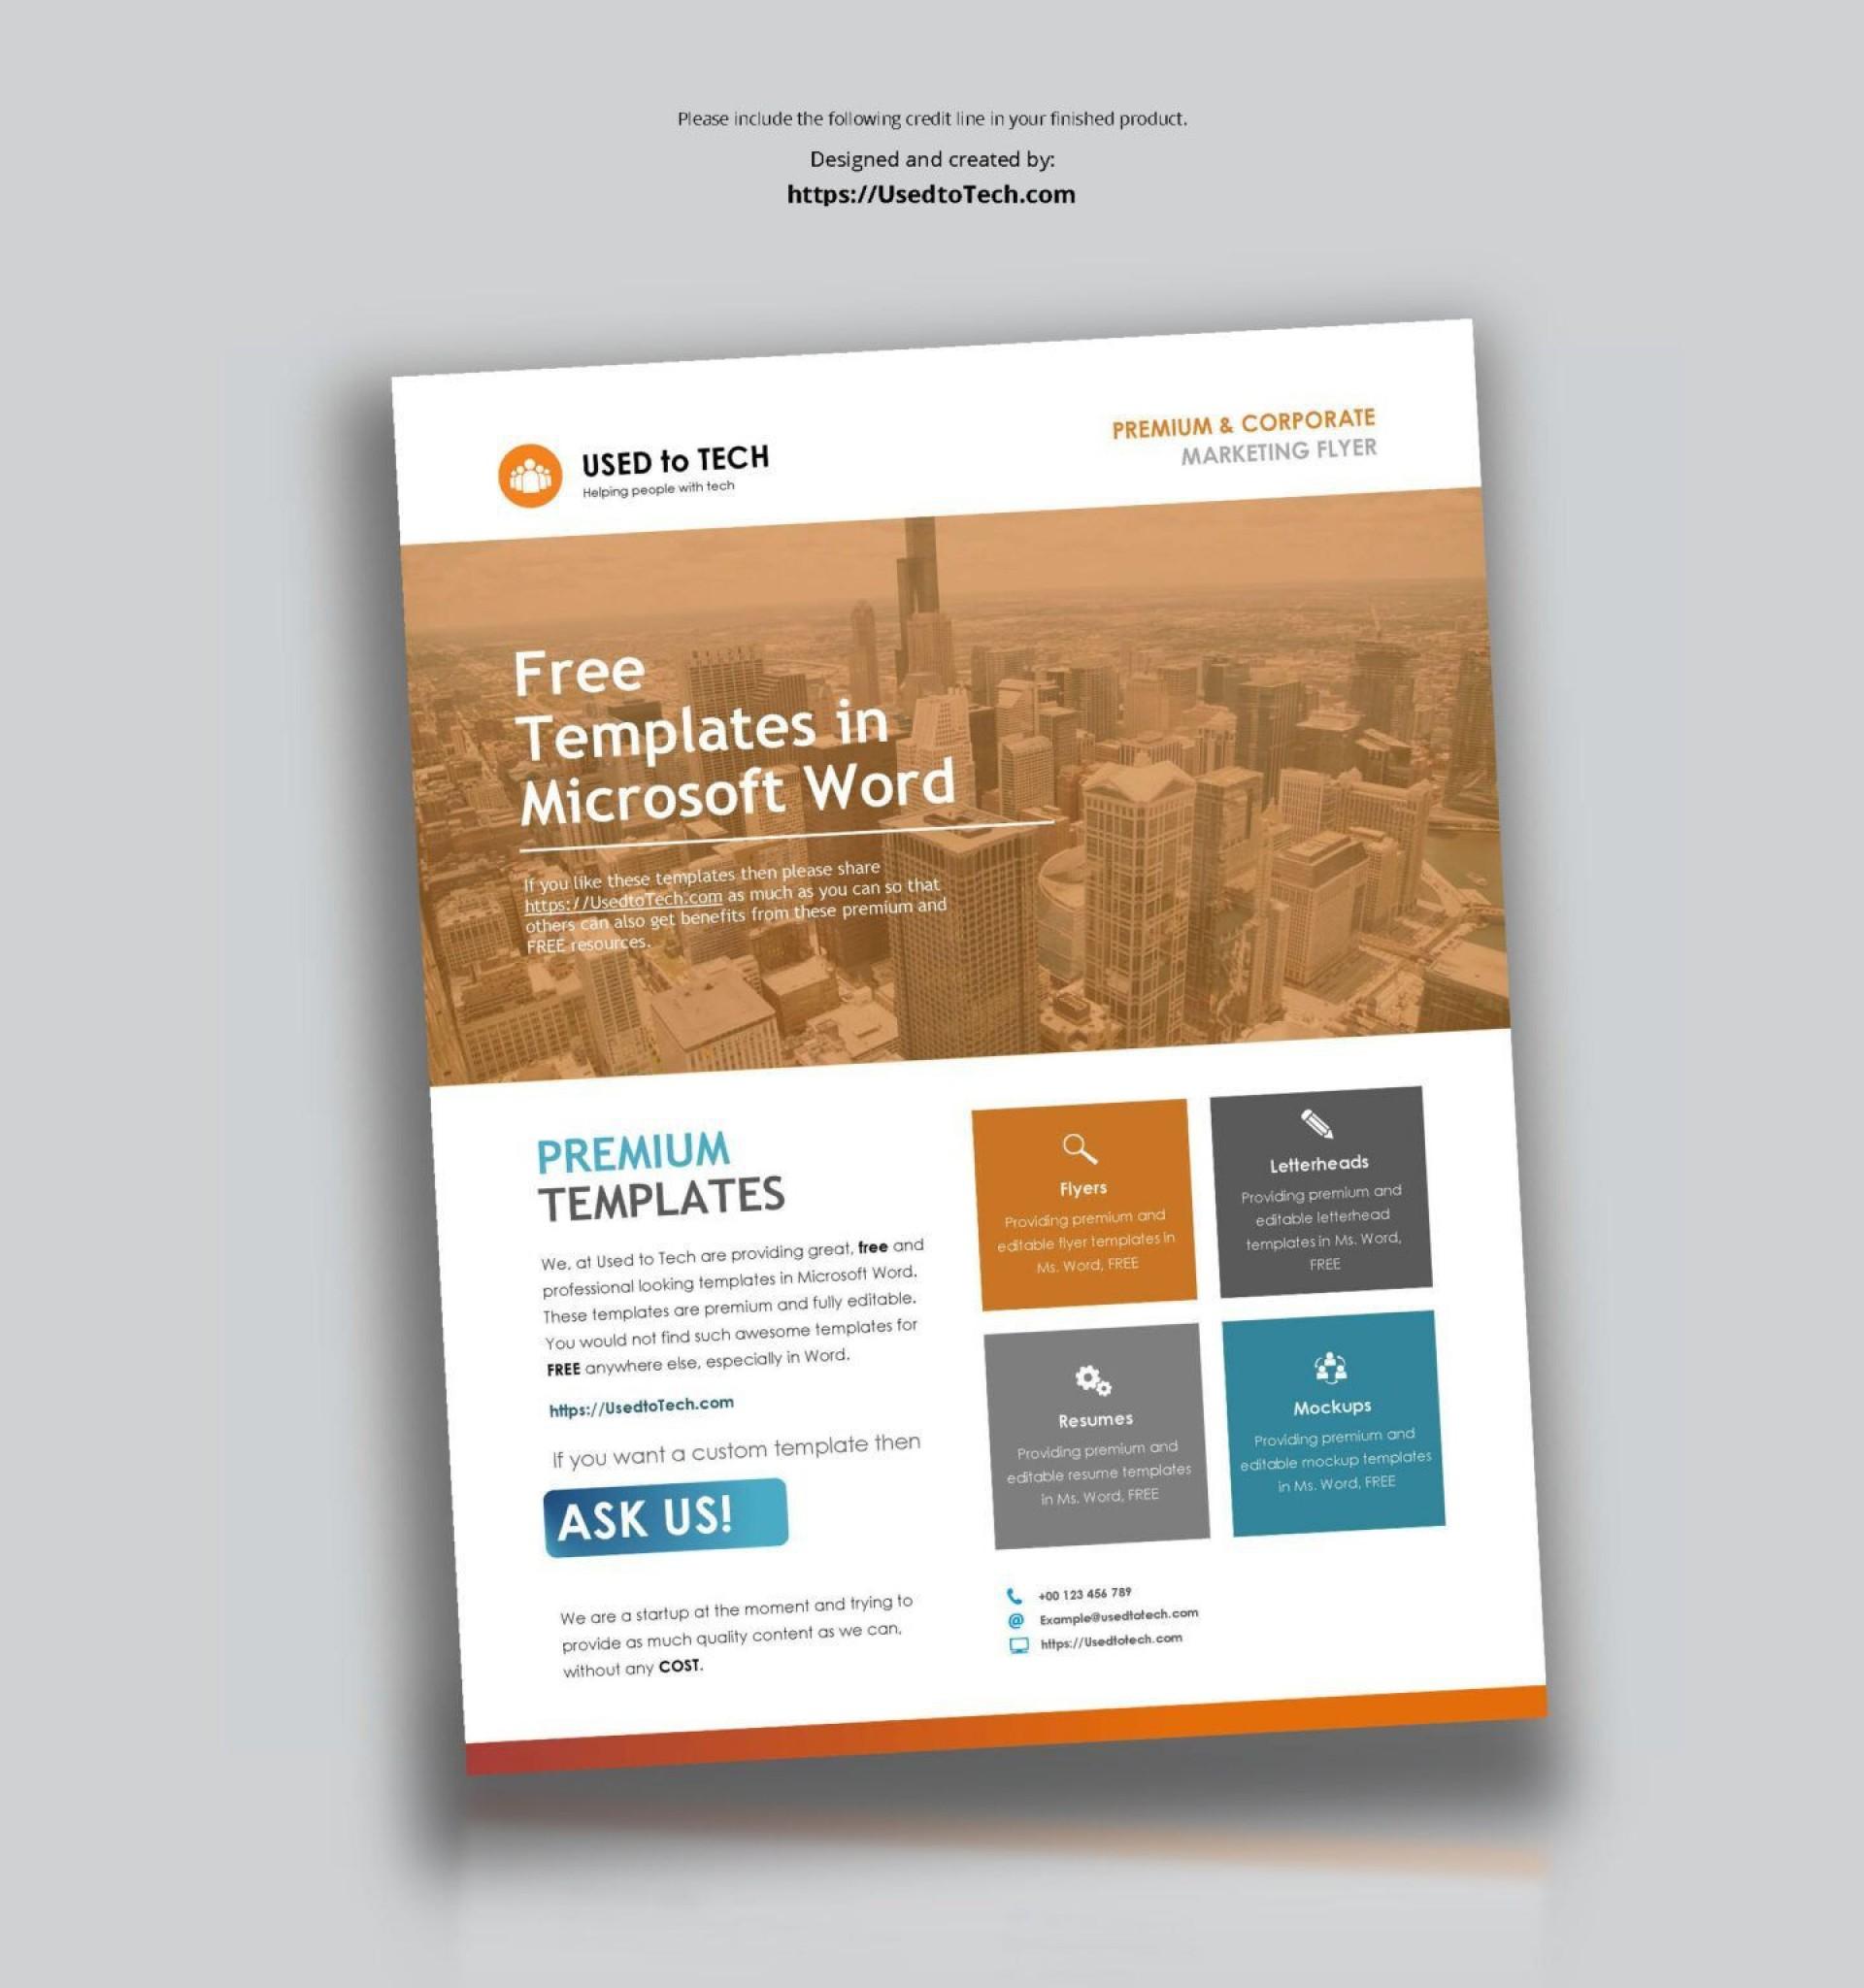 002 Beautiful Template Brochure For Microsoft Word Free Design  Flyer Bowling Tri Fold 20101920